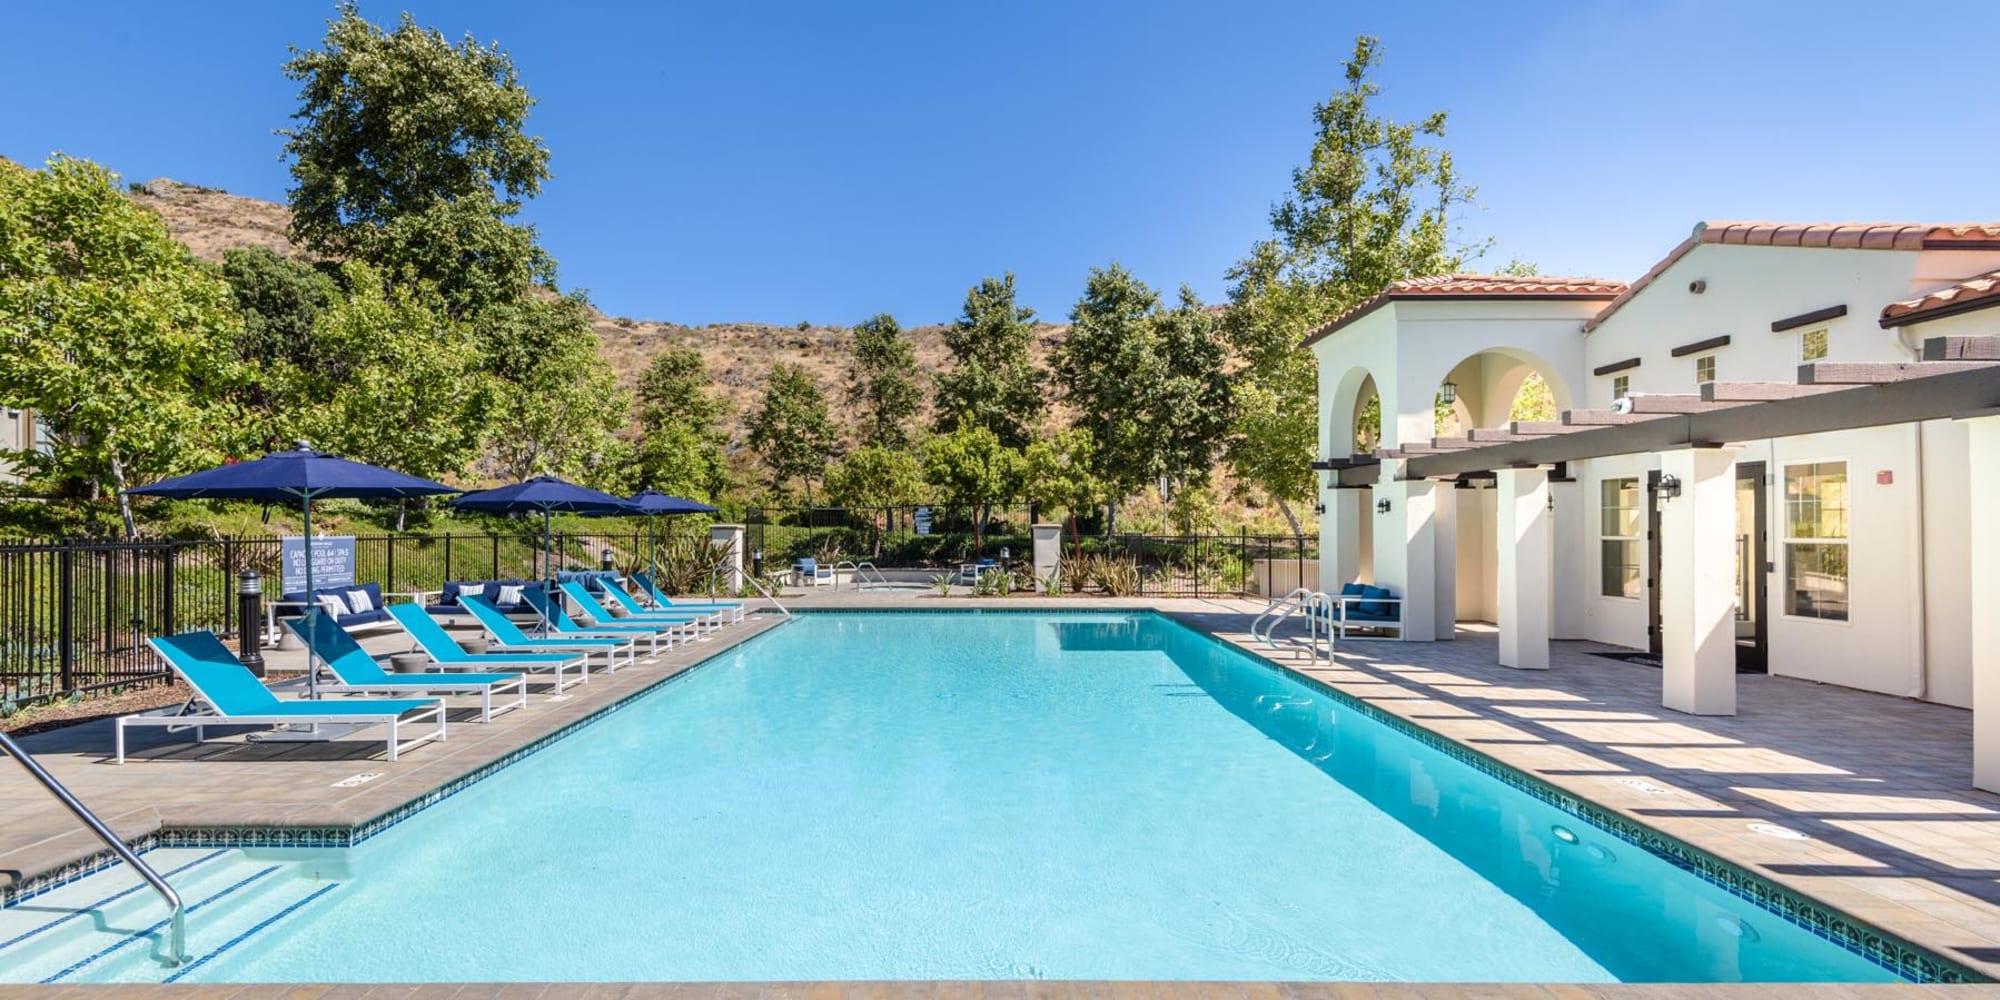 Resort-style swimming pool at Mission Hills in Camarillo, California